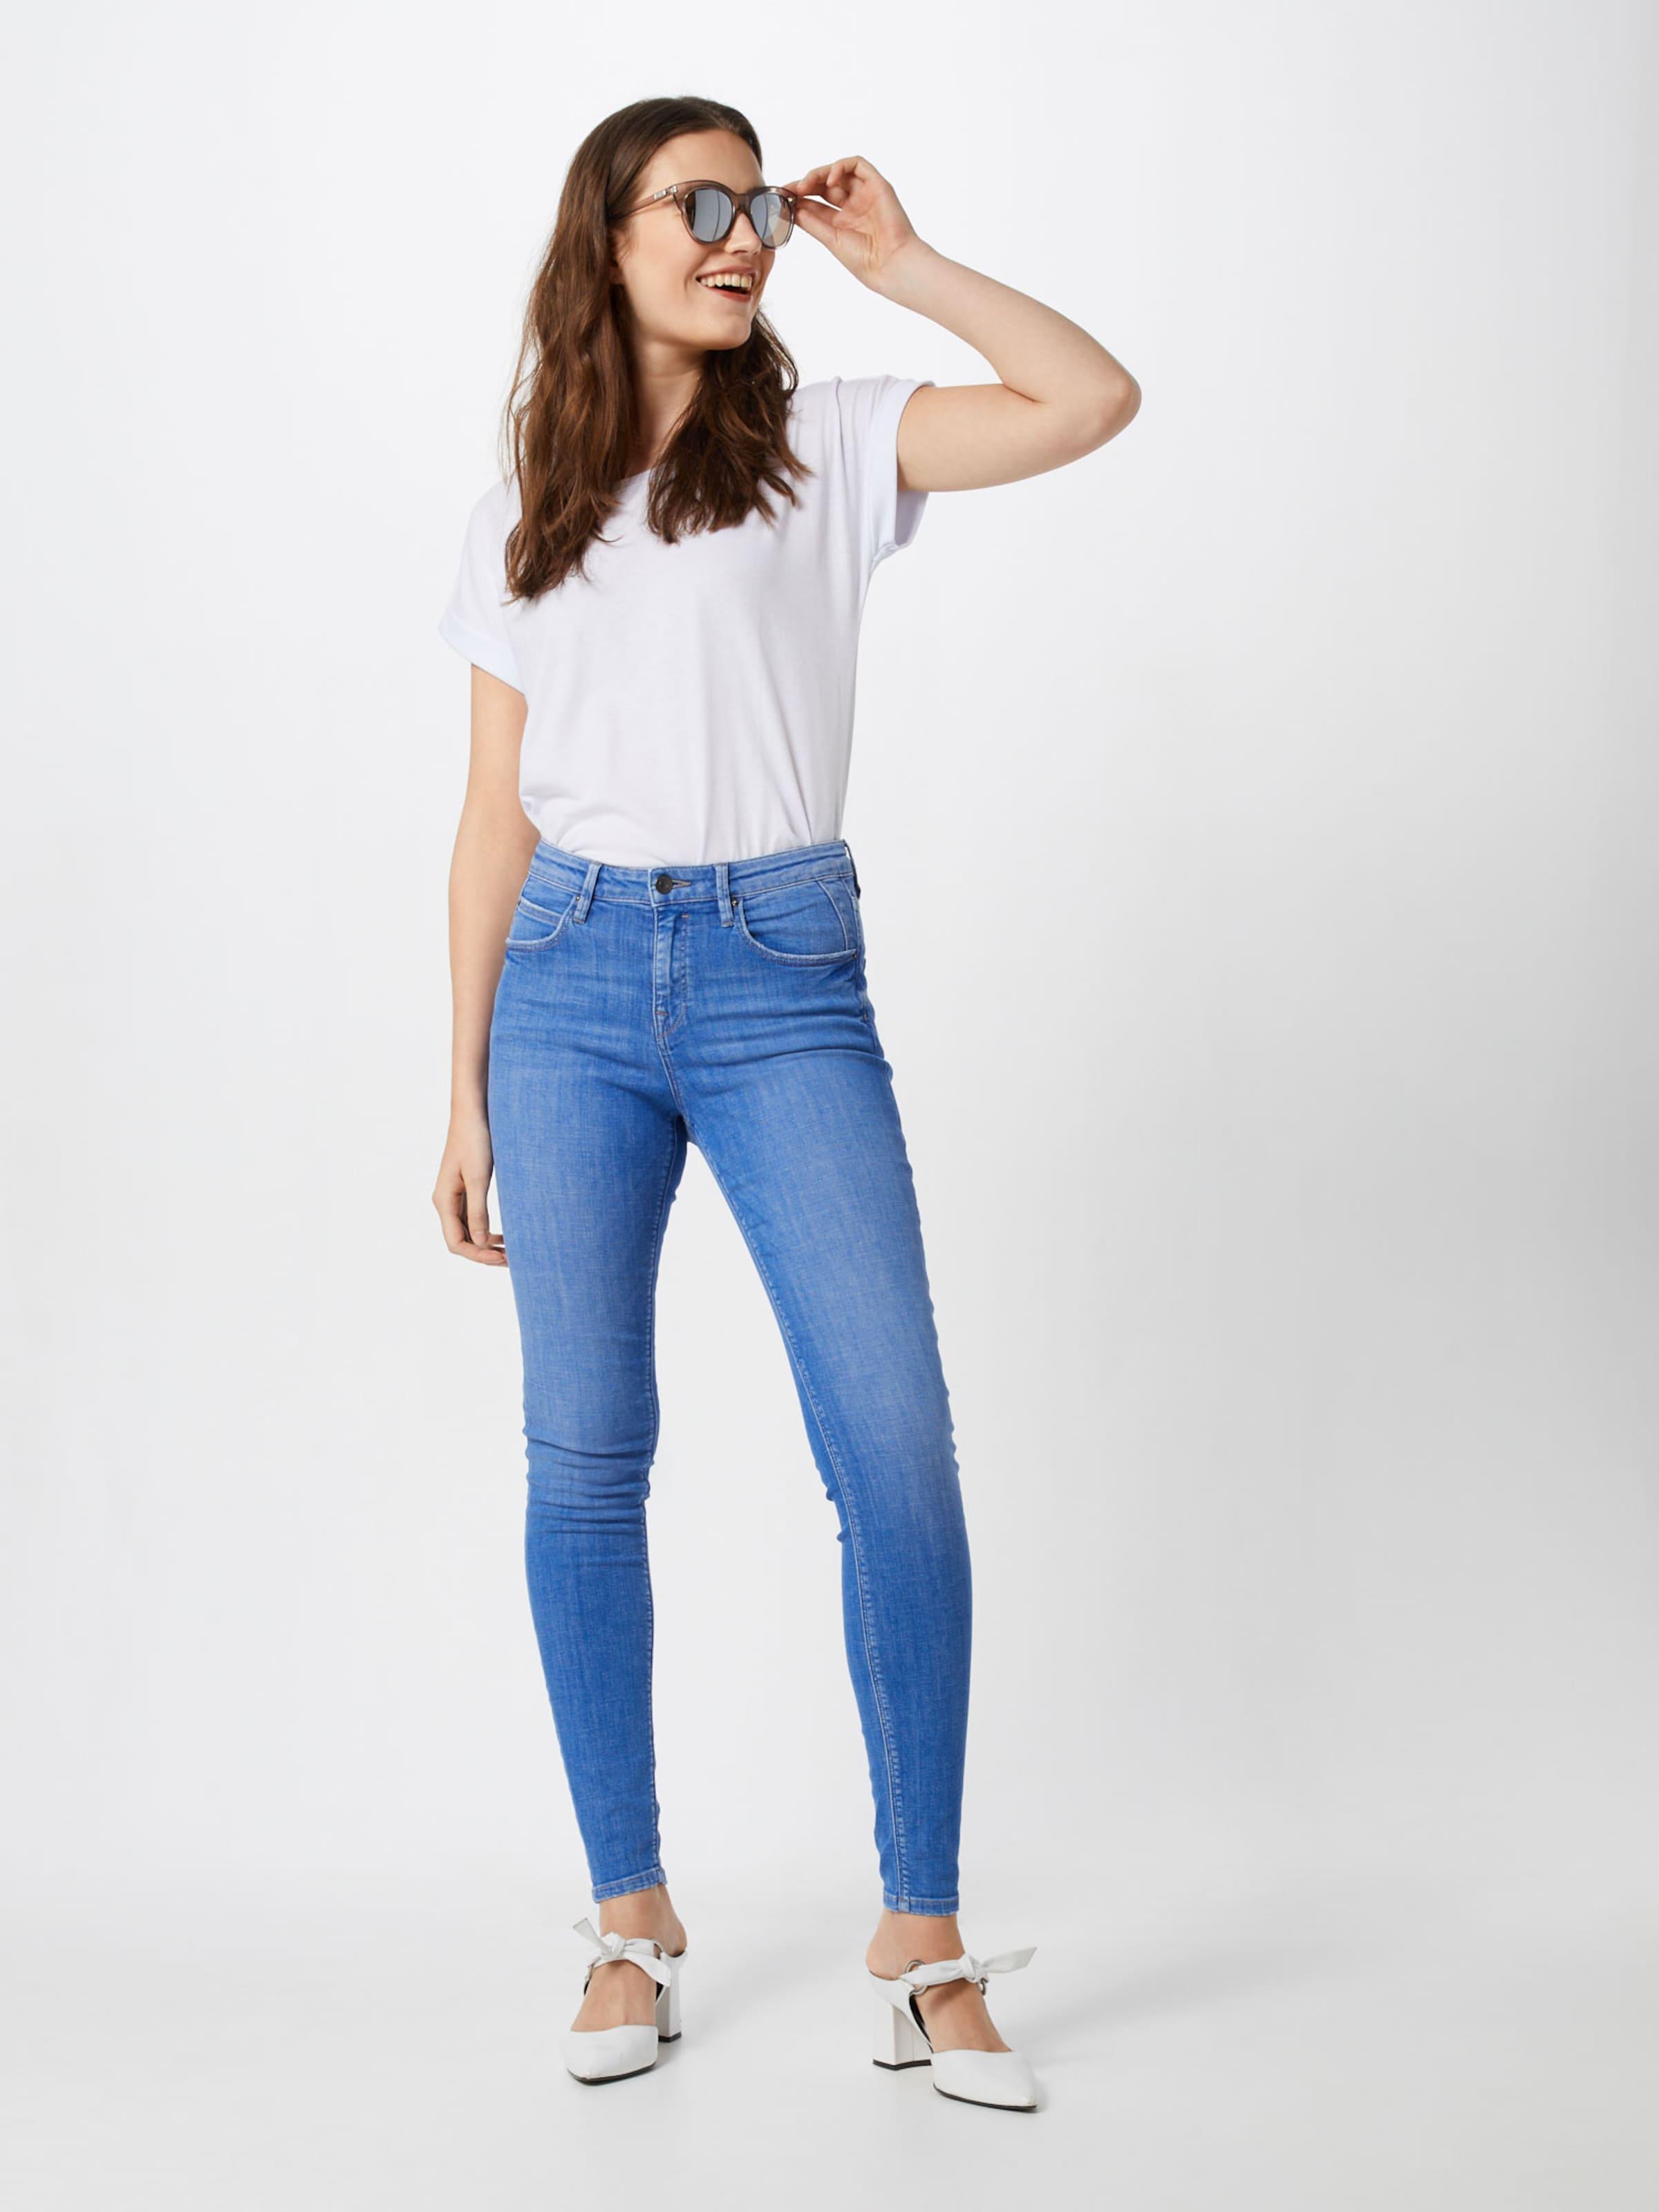 Bleu En Hr Denim Jean Skin Esprit 'osn Ocs Edc By Pants Denim' 8mvn0NwOy